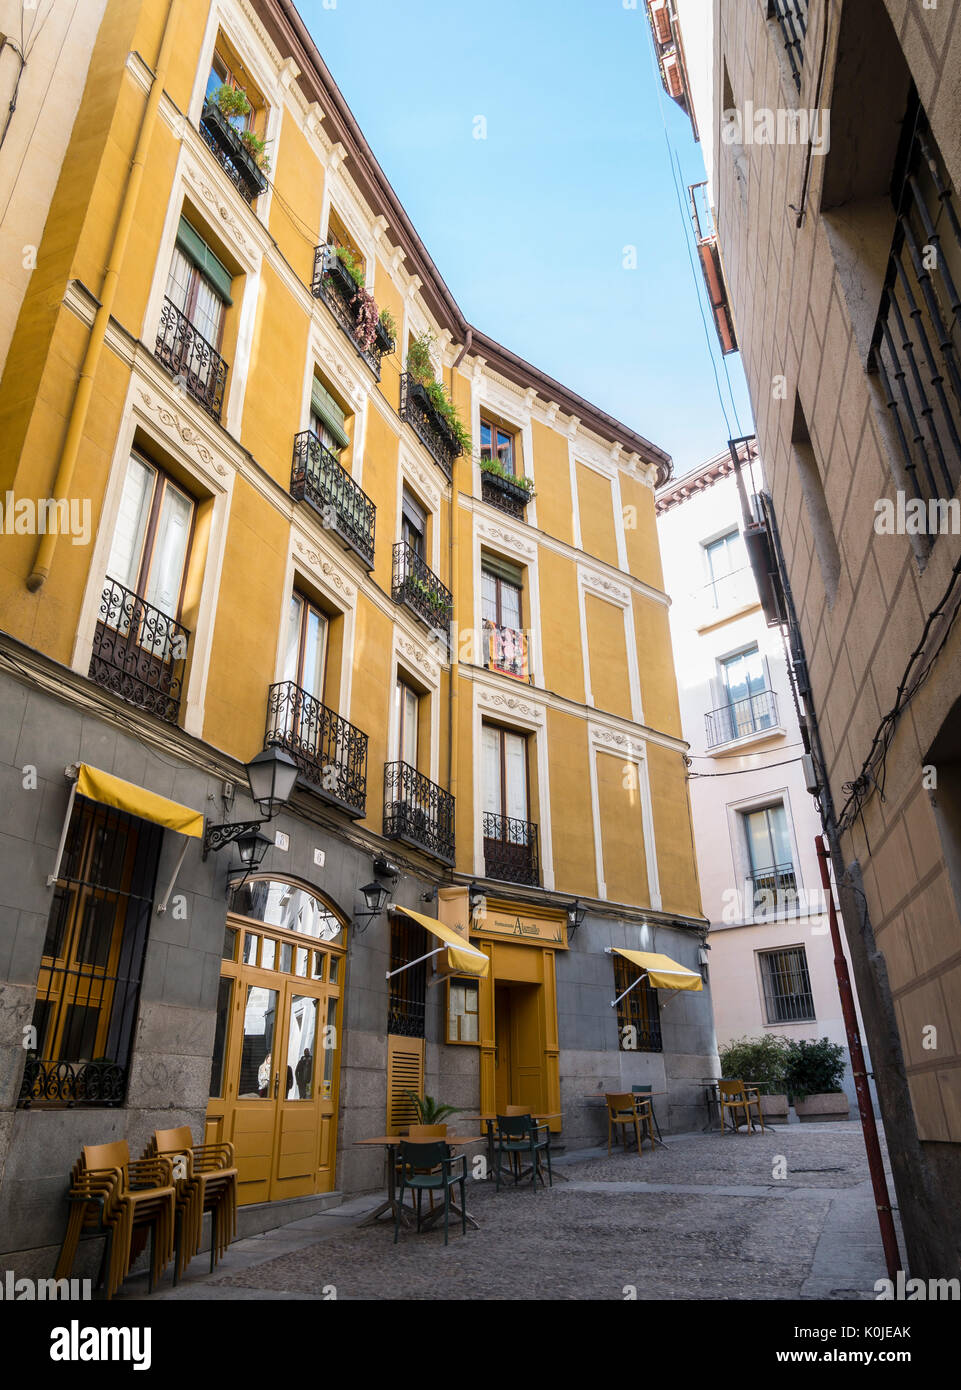 Arquitectura típica. Madrid capital. España Stock Photo